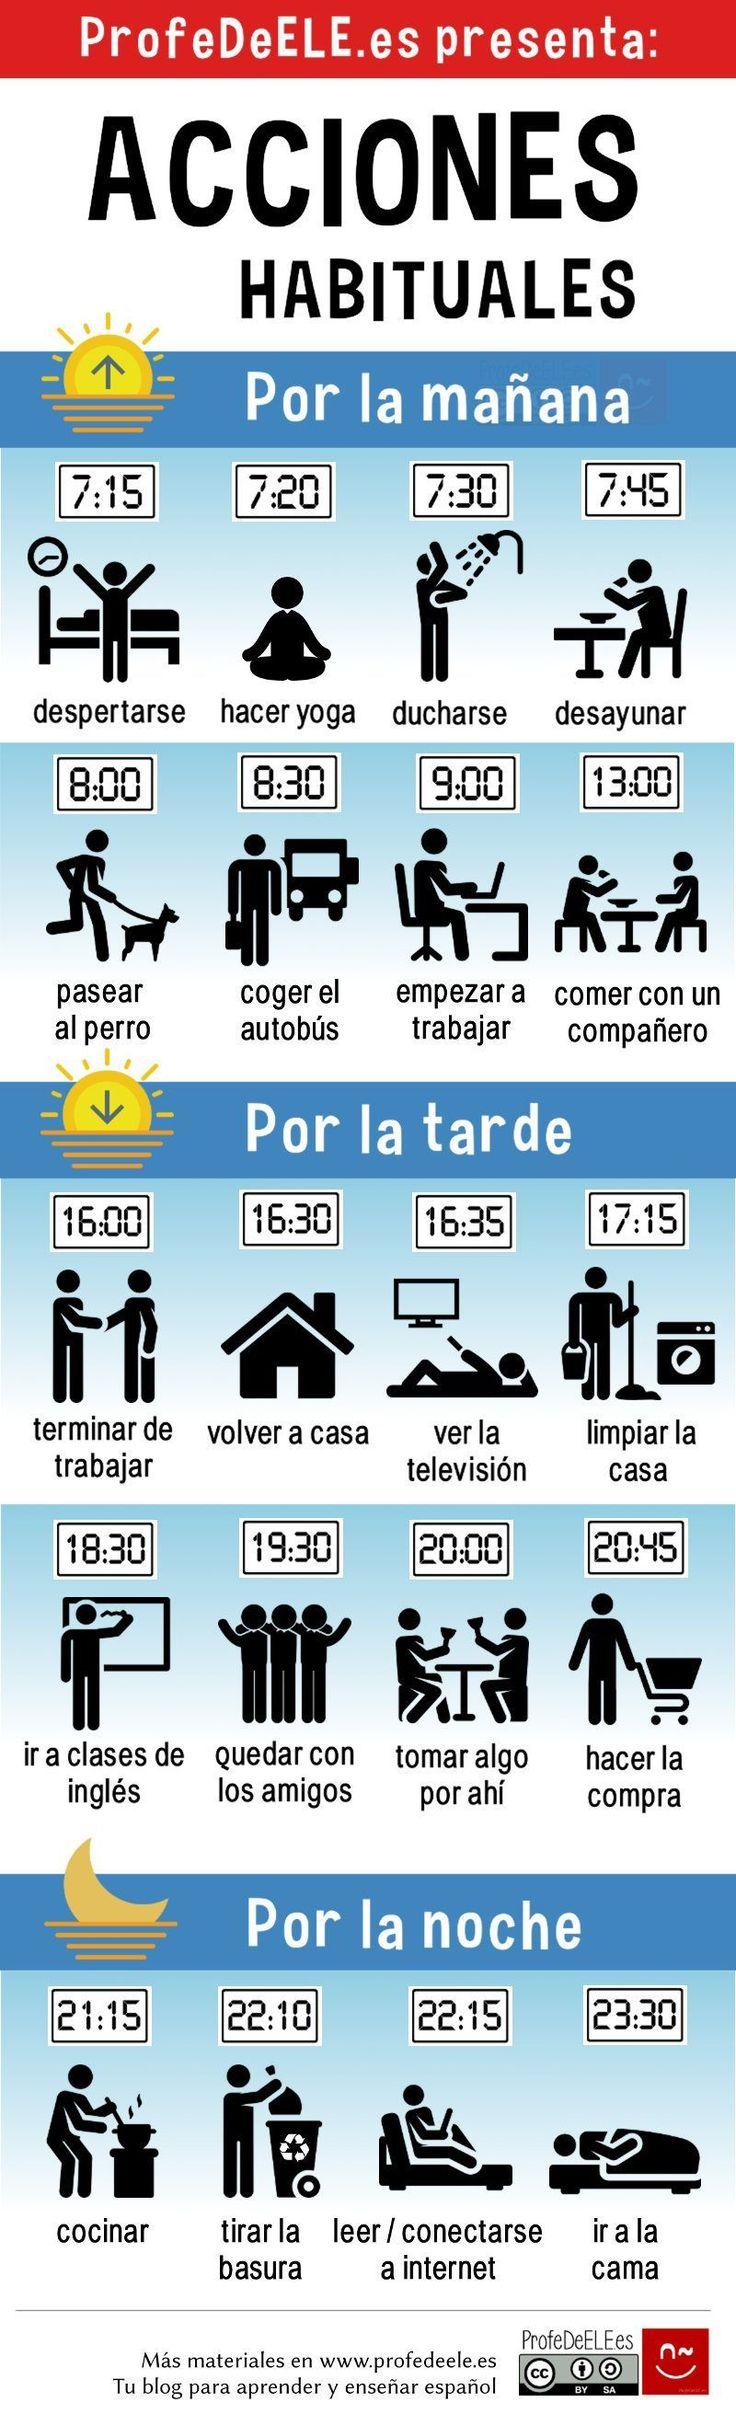 Acciones habituales - Infografía - vocabulario español #SpanishLessons #spanishlanguagetips